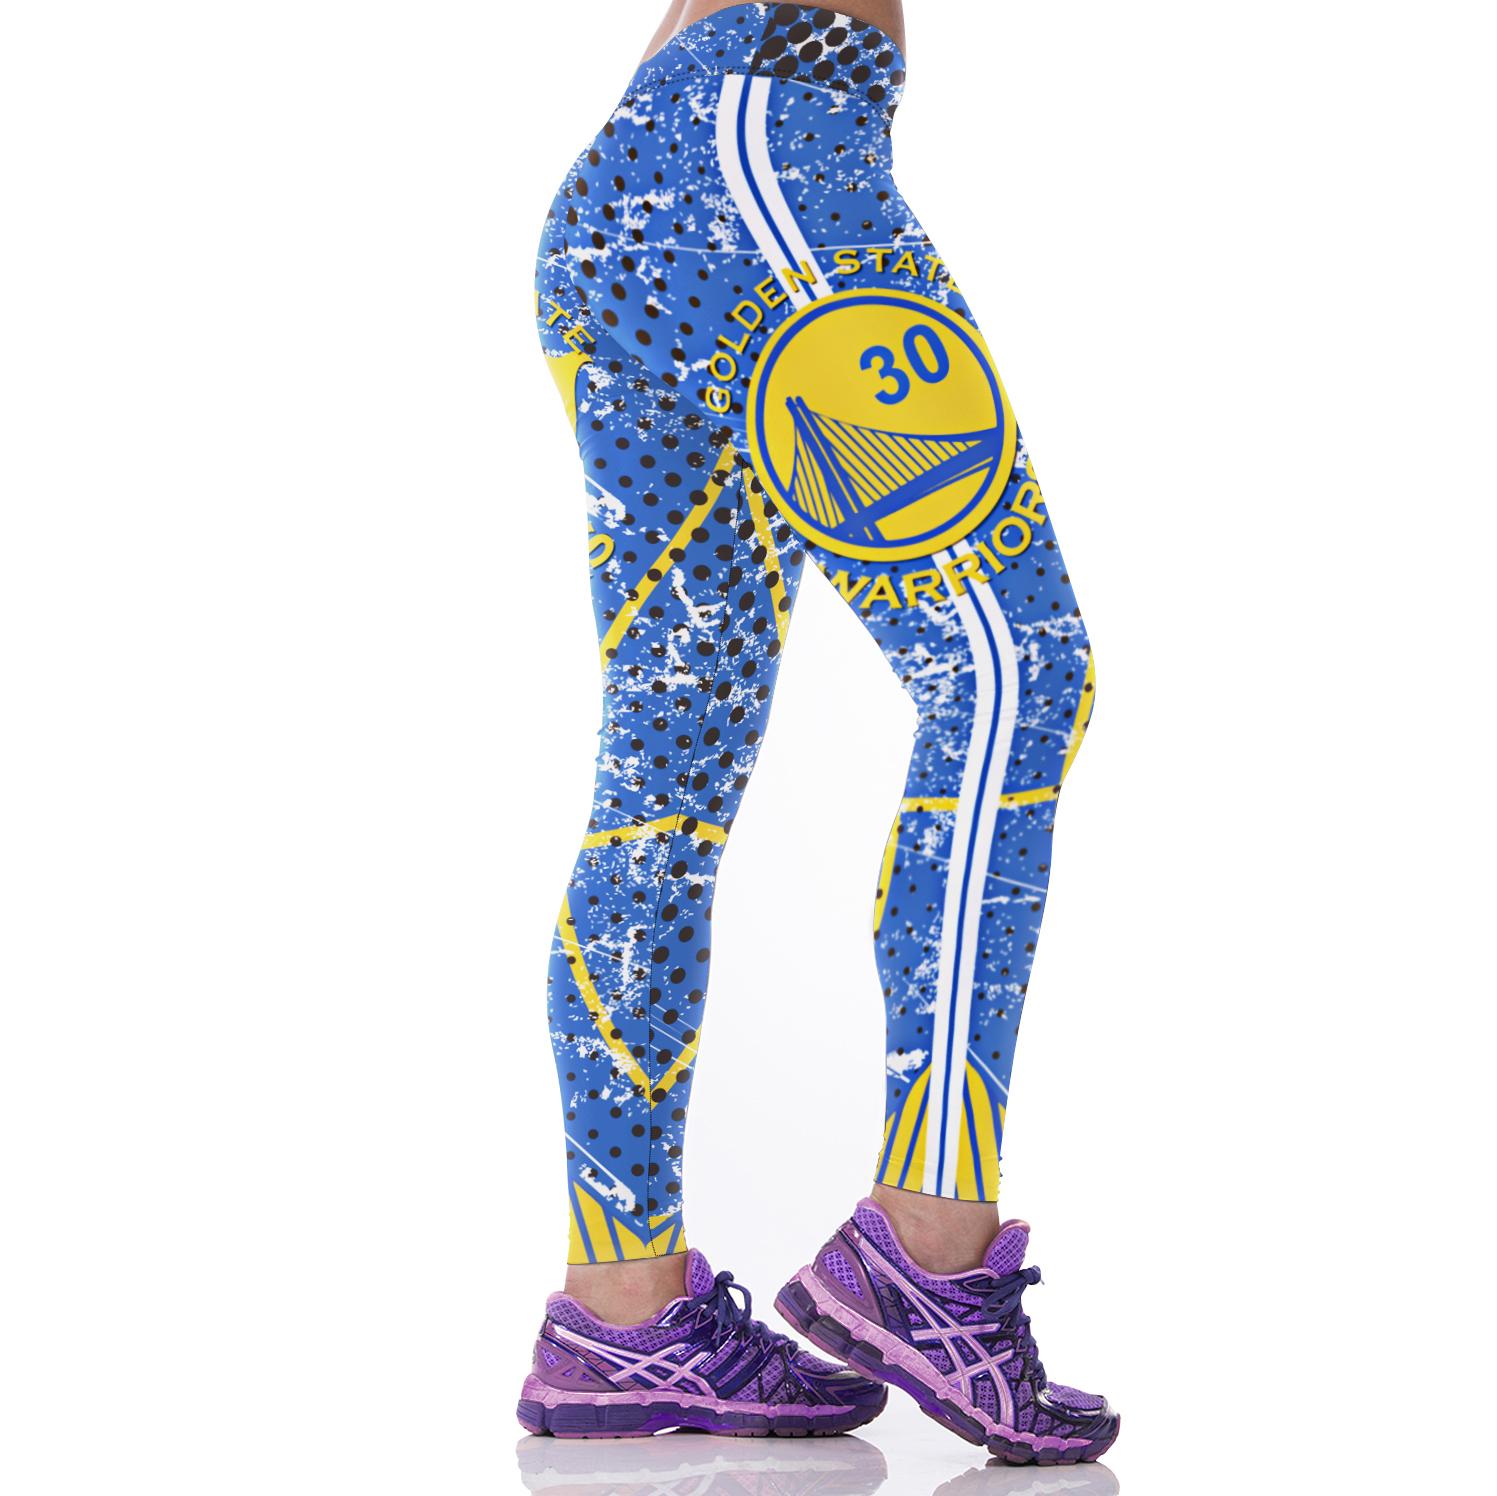 62050163 ... New Golden State Warriors NBA Women Leggings Fitness Sports Gym -  Thumbnail ...